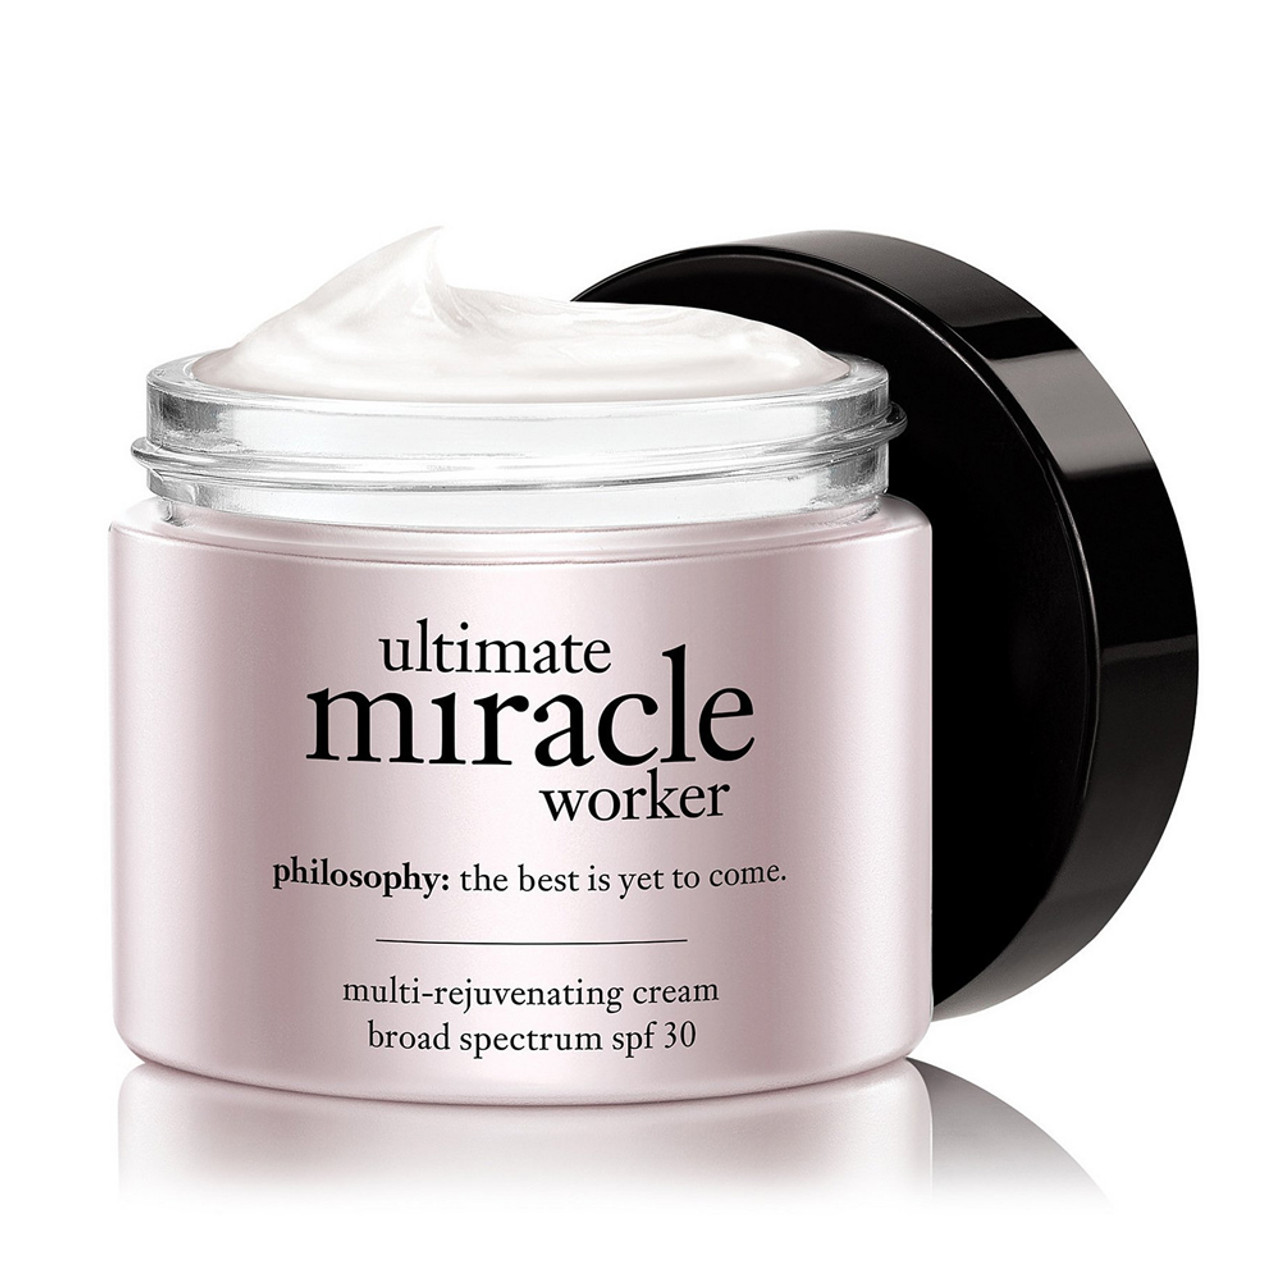 philosophy Ultimate Miracle Worker Multi-Rejuvenating Cream SPF 30